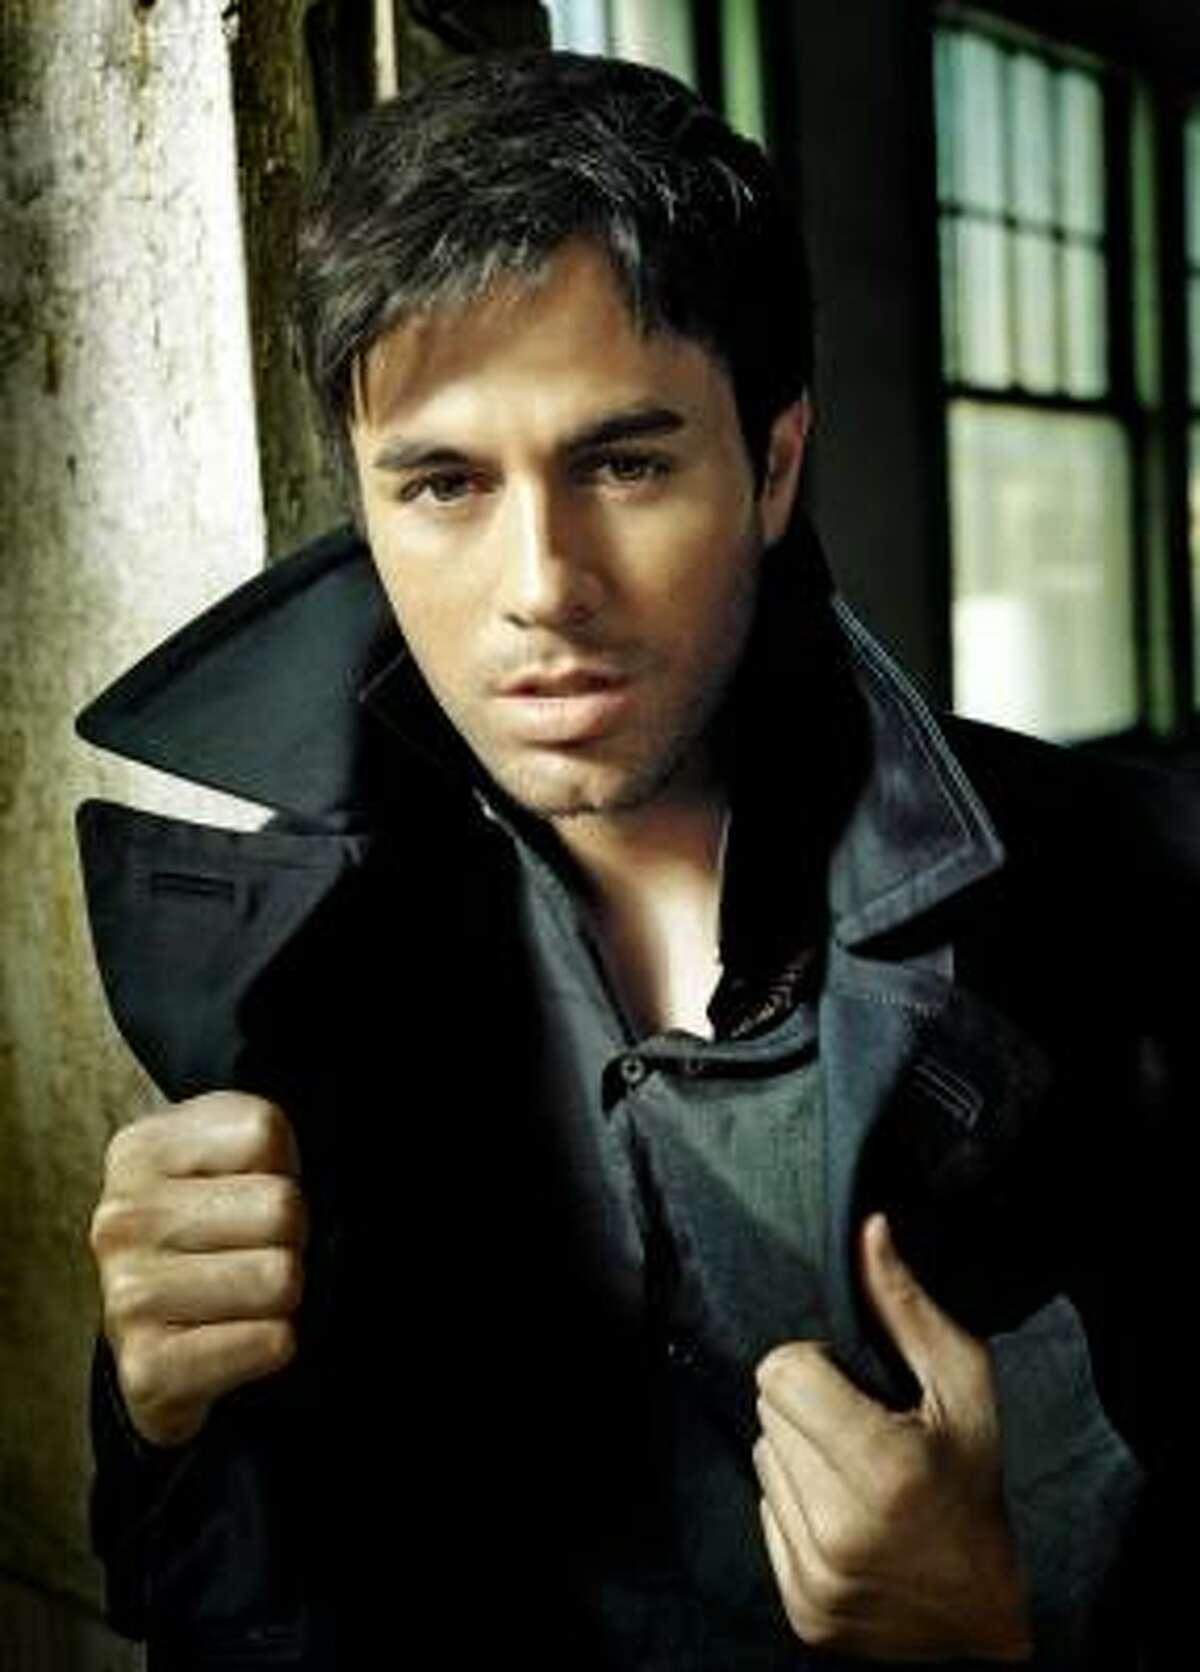 Insomniac is Enrique Iglesias' first English-language album in four years.